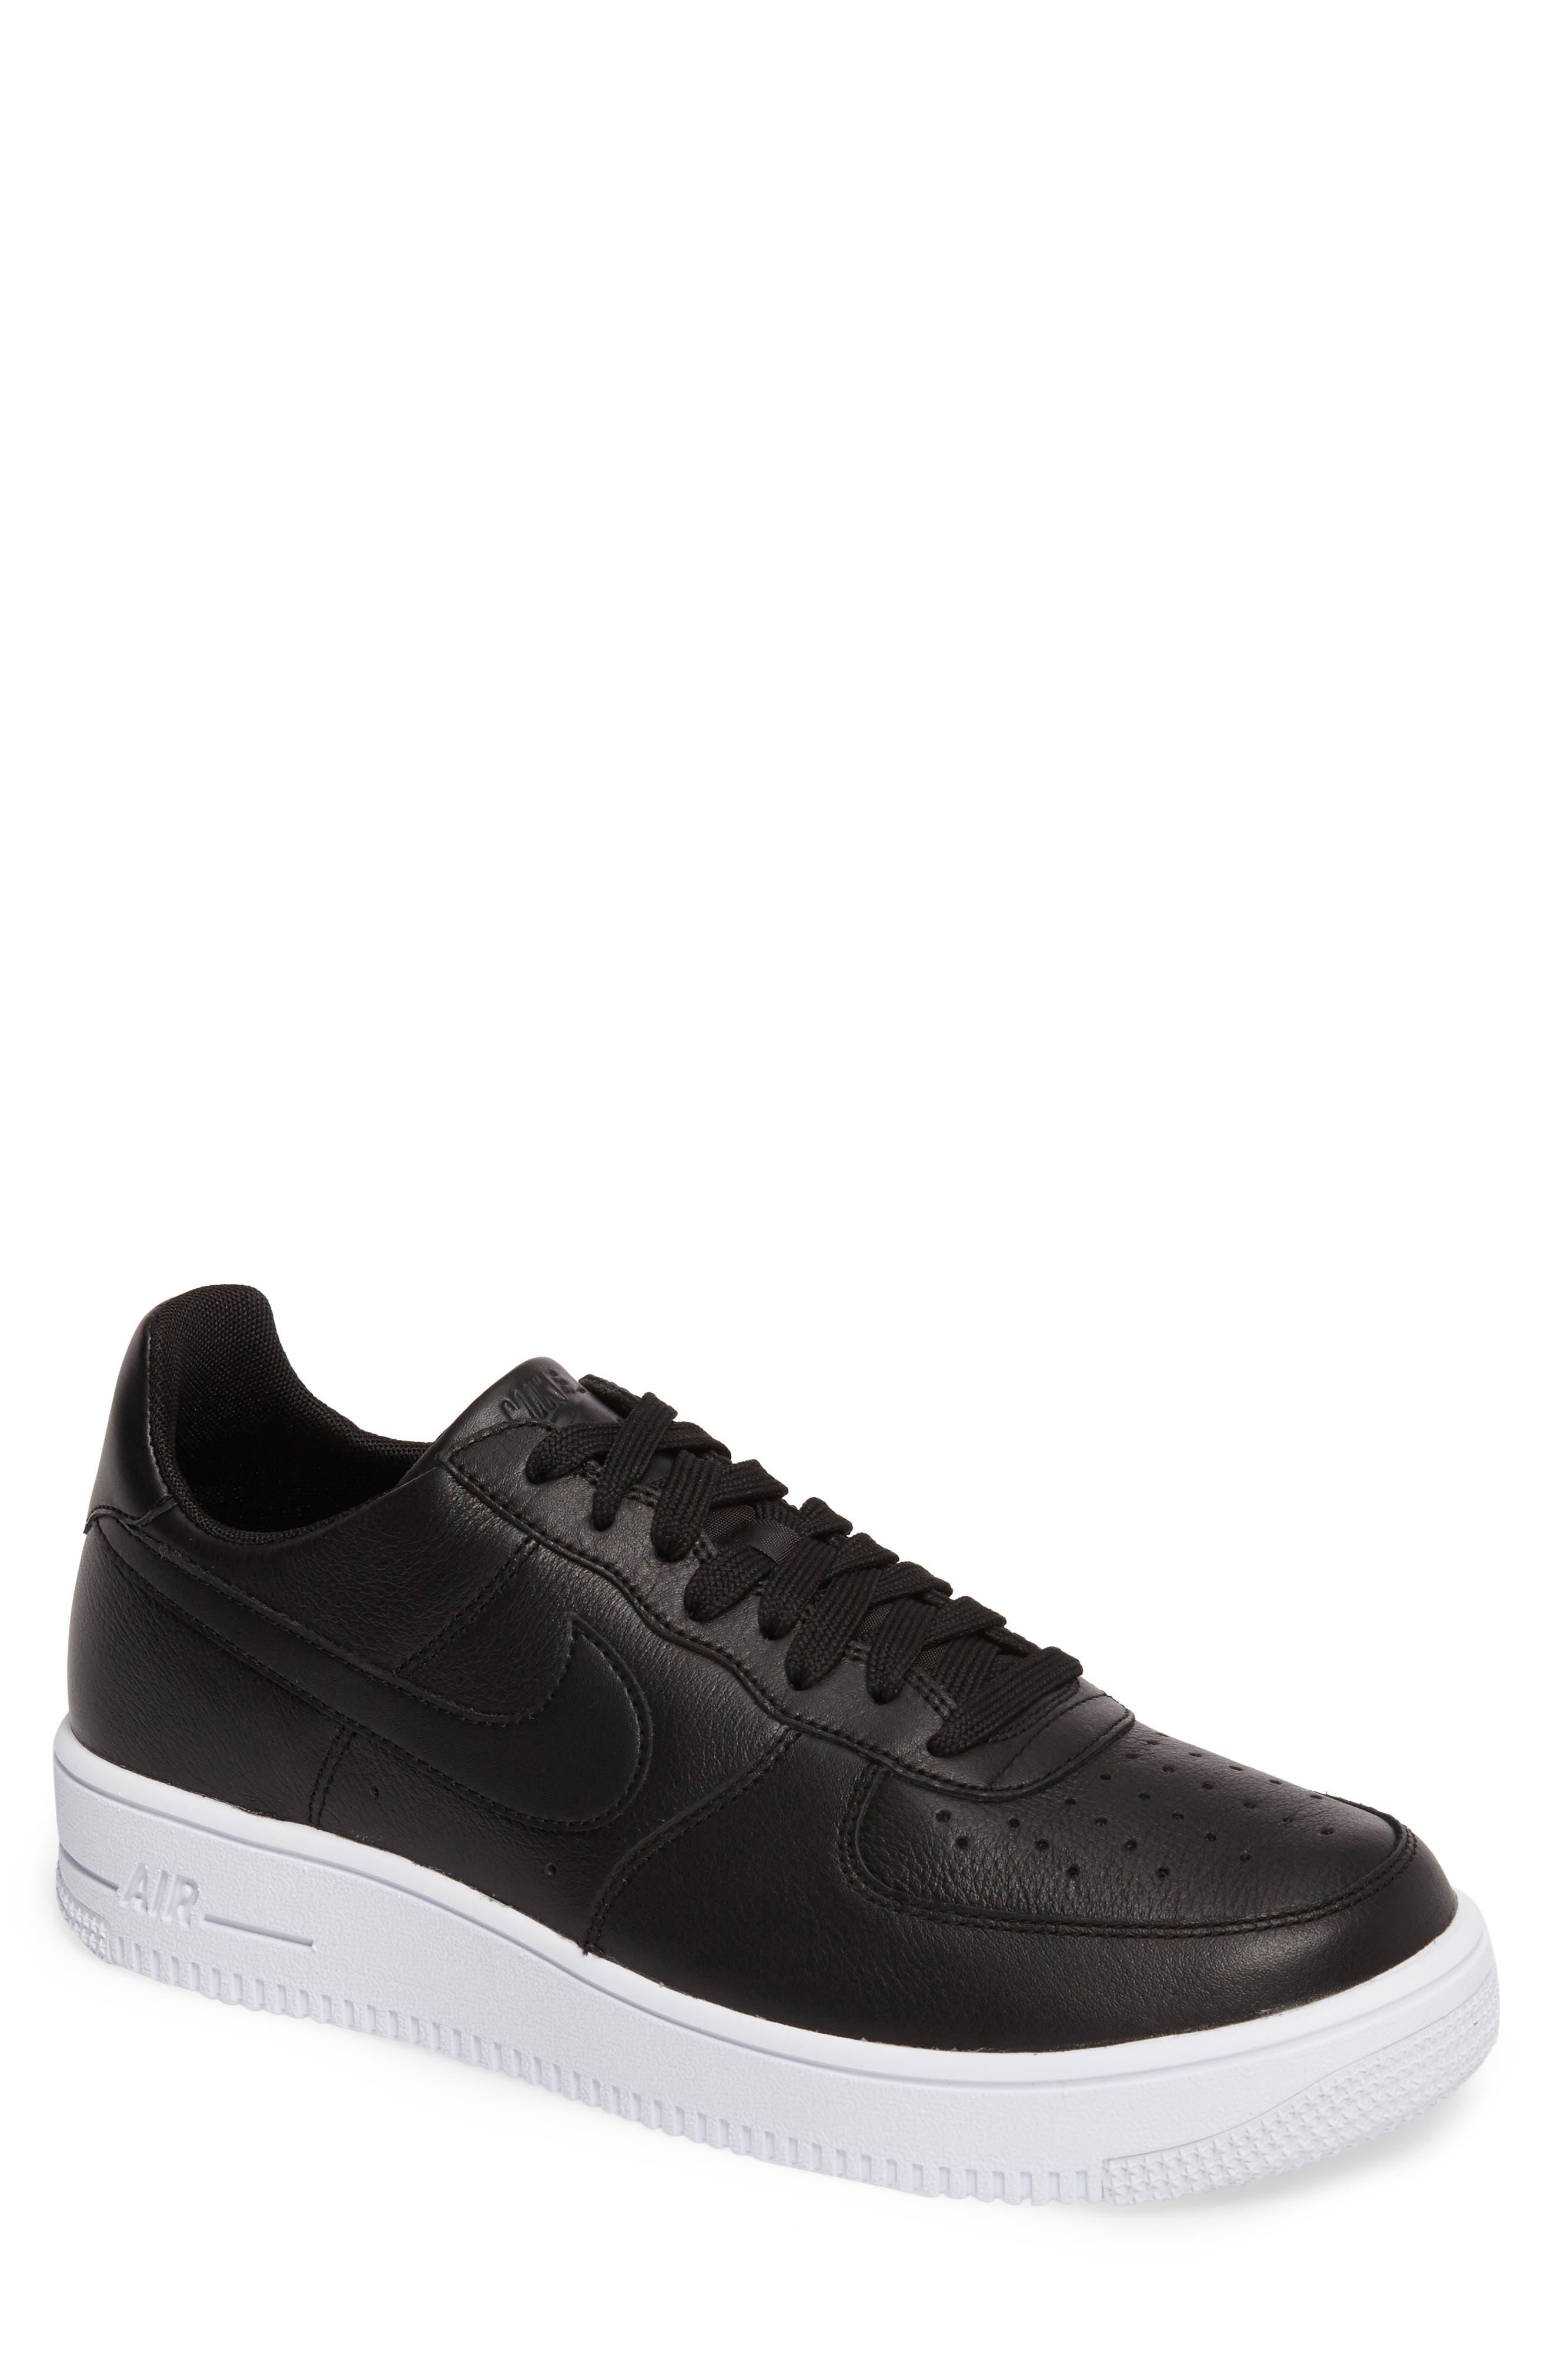 Air Force 1 Ultraforce Sneaker,                             Main thumbnail 1, color,